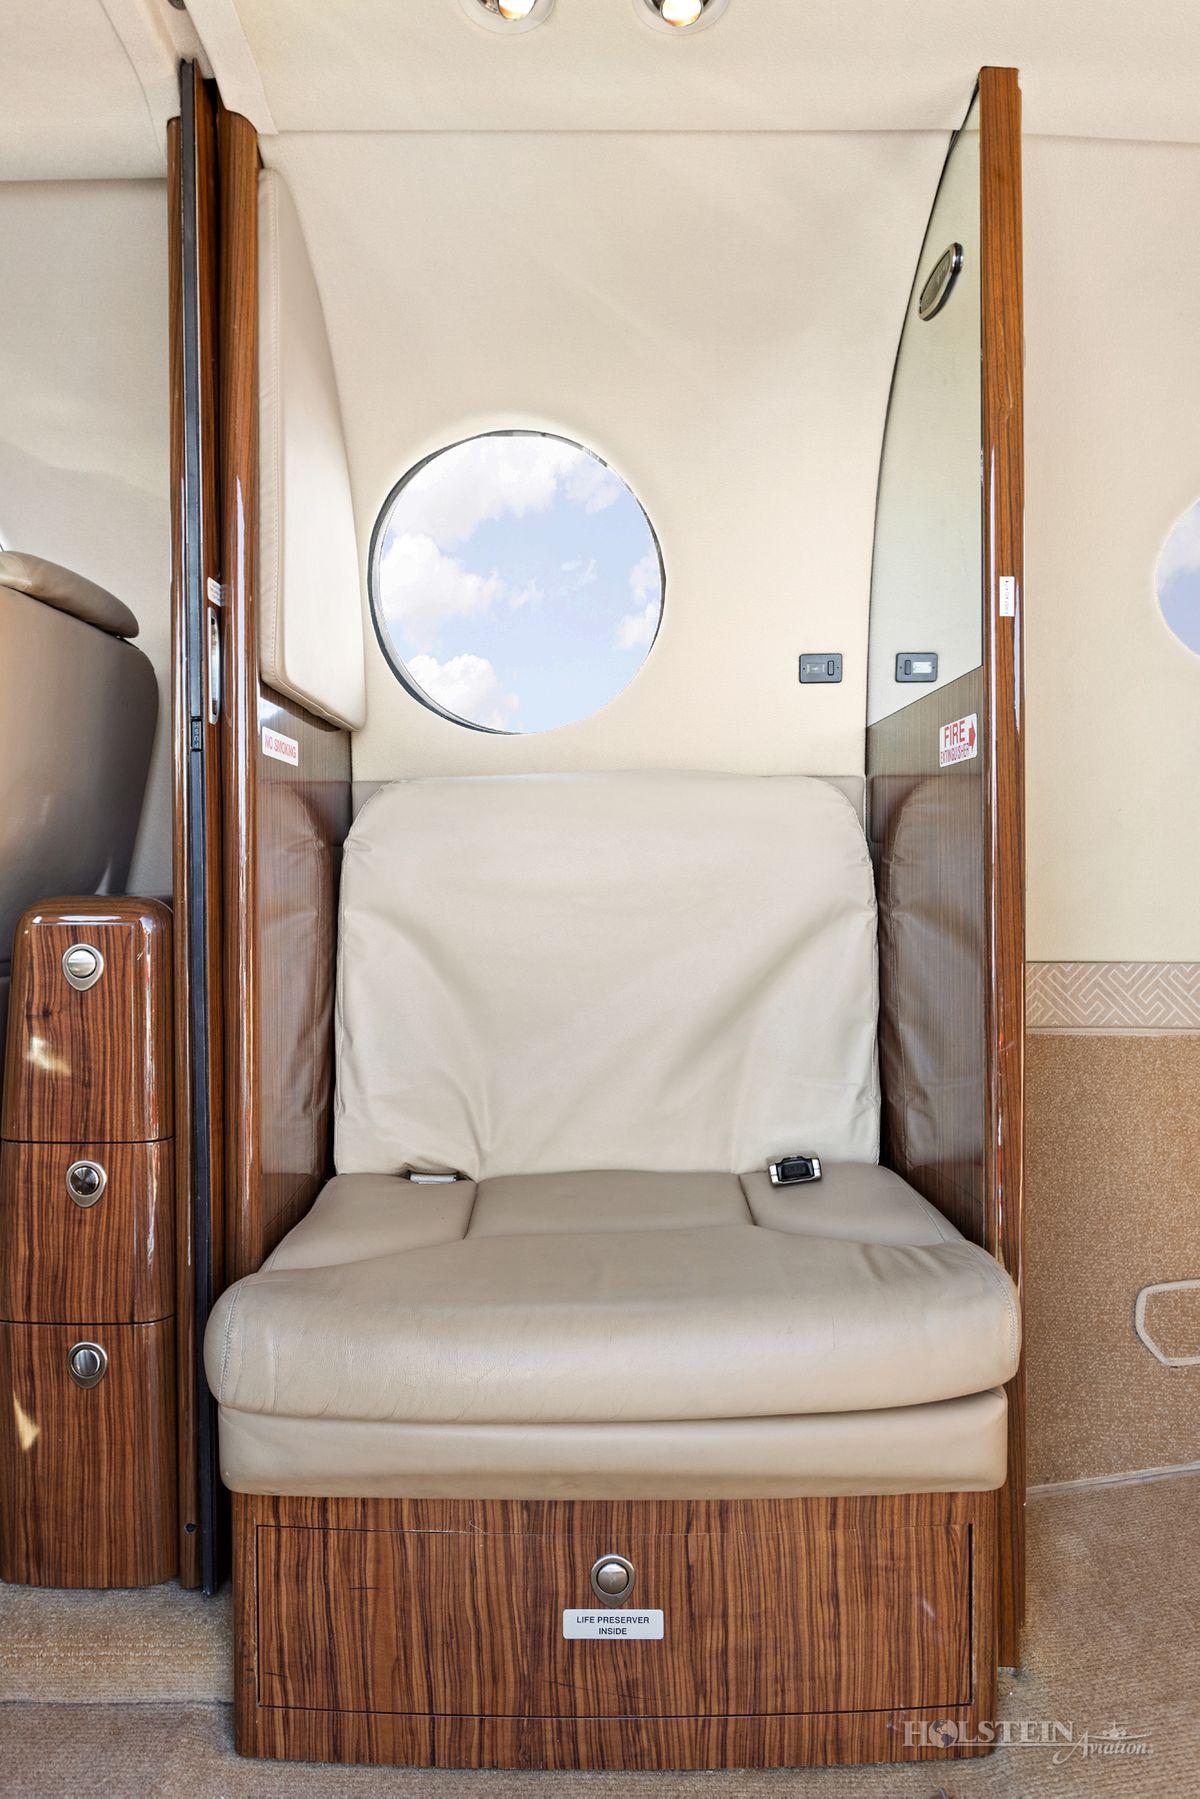 2012 King Air 350i - FL-822 -  N935JC - Int - Side Fac Lav Seat RGB.jpg